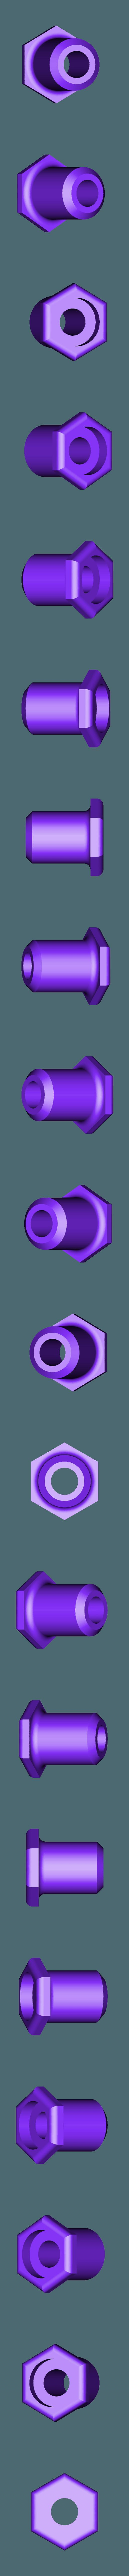 aro.stl Download free STL file FORD_F100 • Design to 3D print, Santiago90